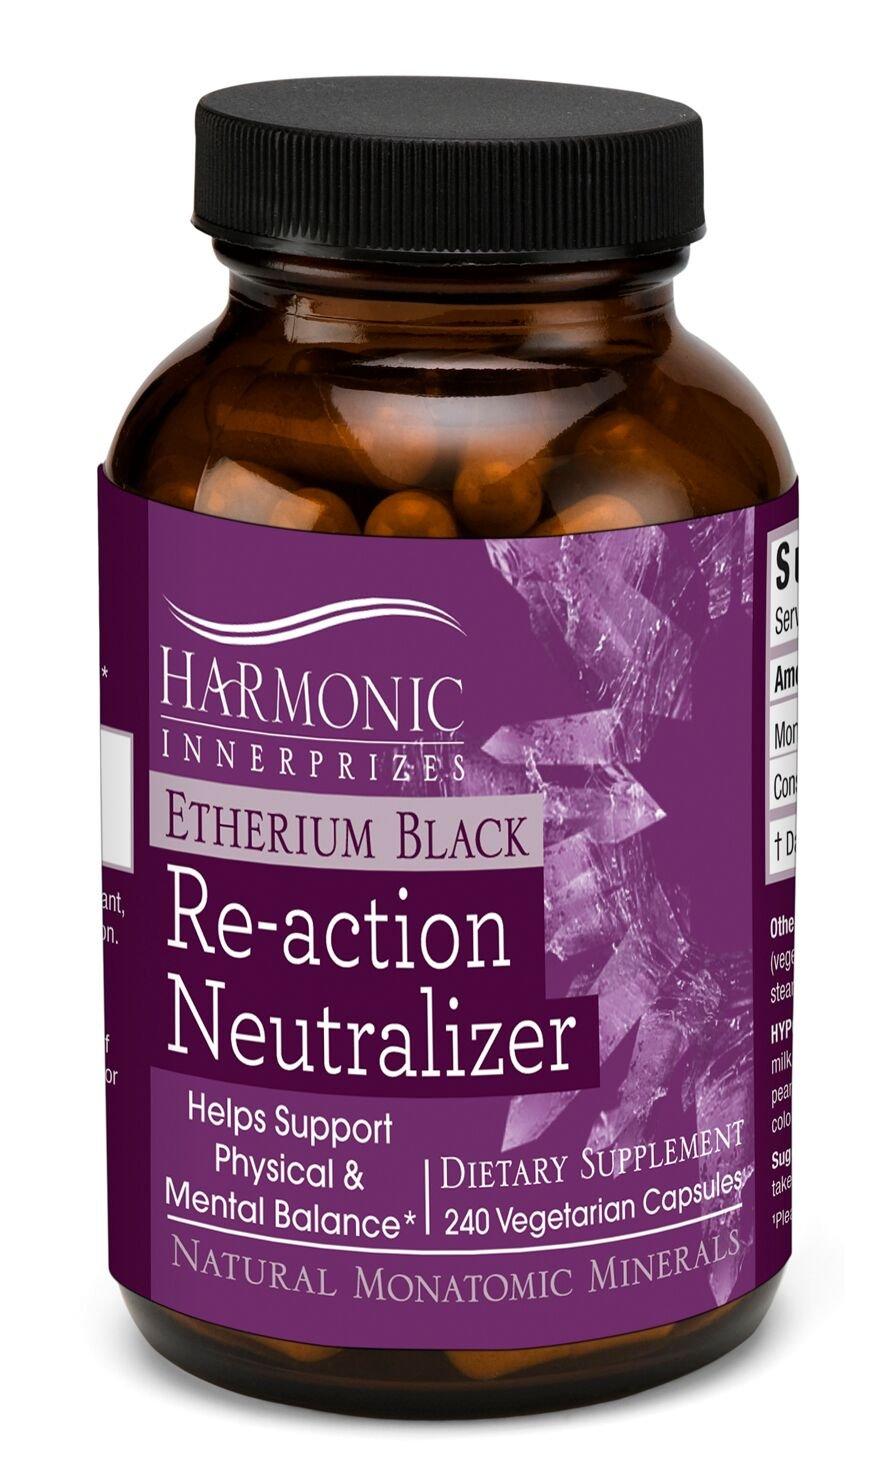 Harmonic Innerprizes Etherium Black 240 Caps